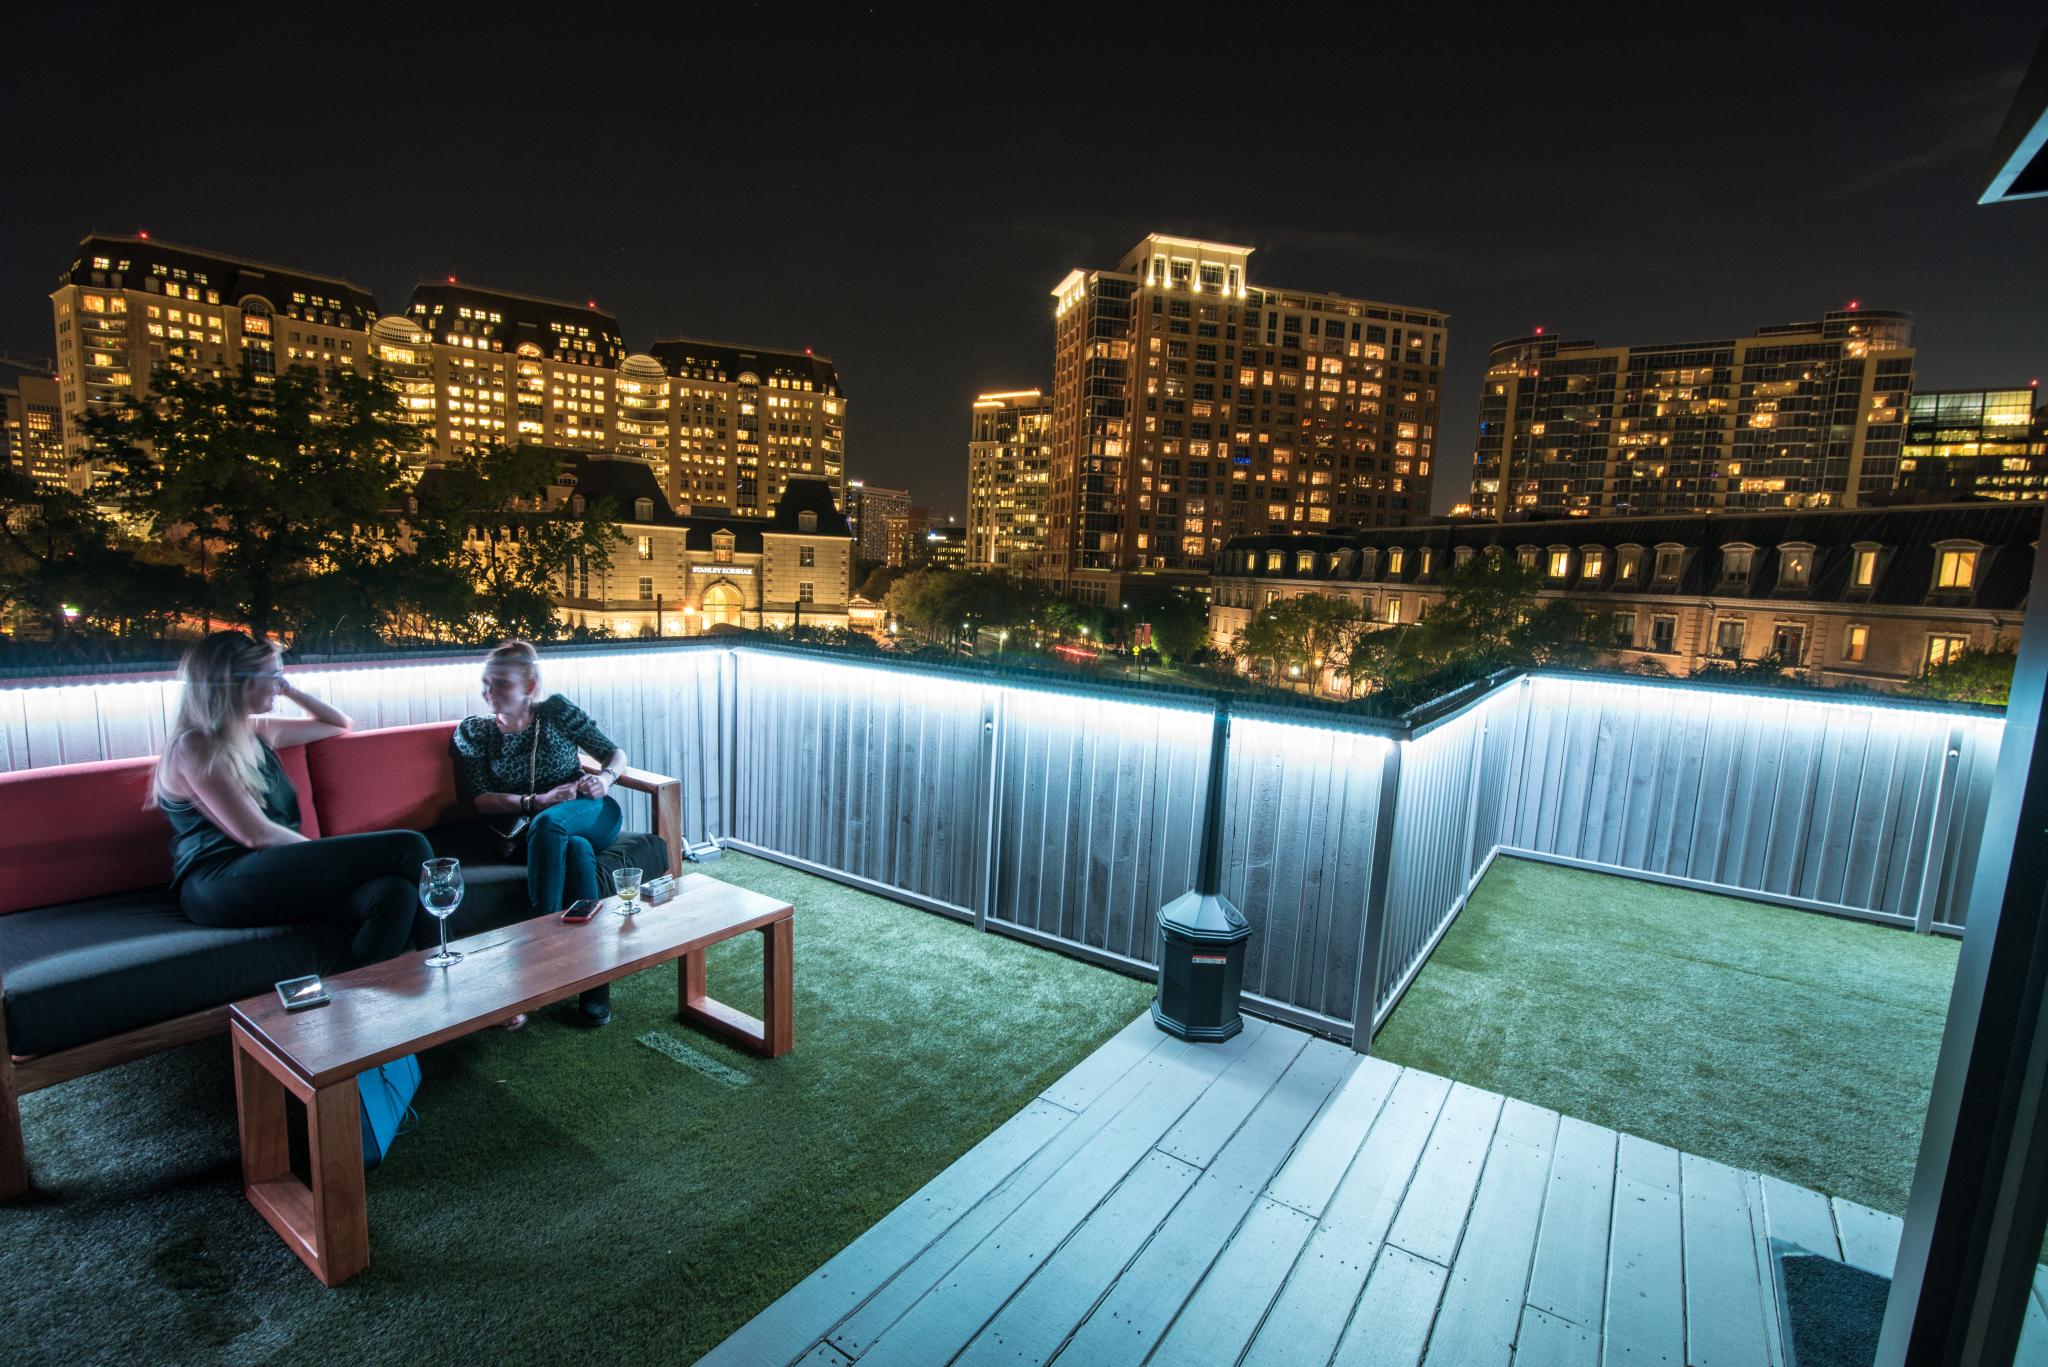 23 Must-Visit Rooftop Bars & Restaurants in Dallas–Fort Worth - Zagat